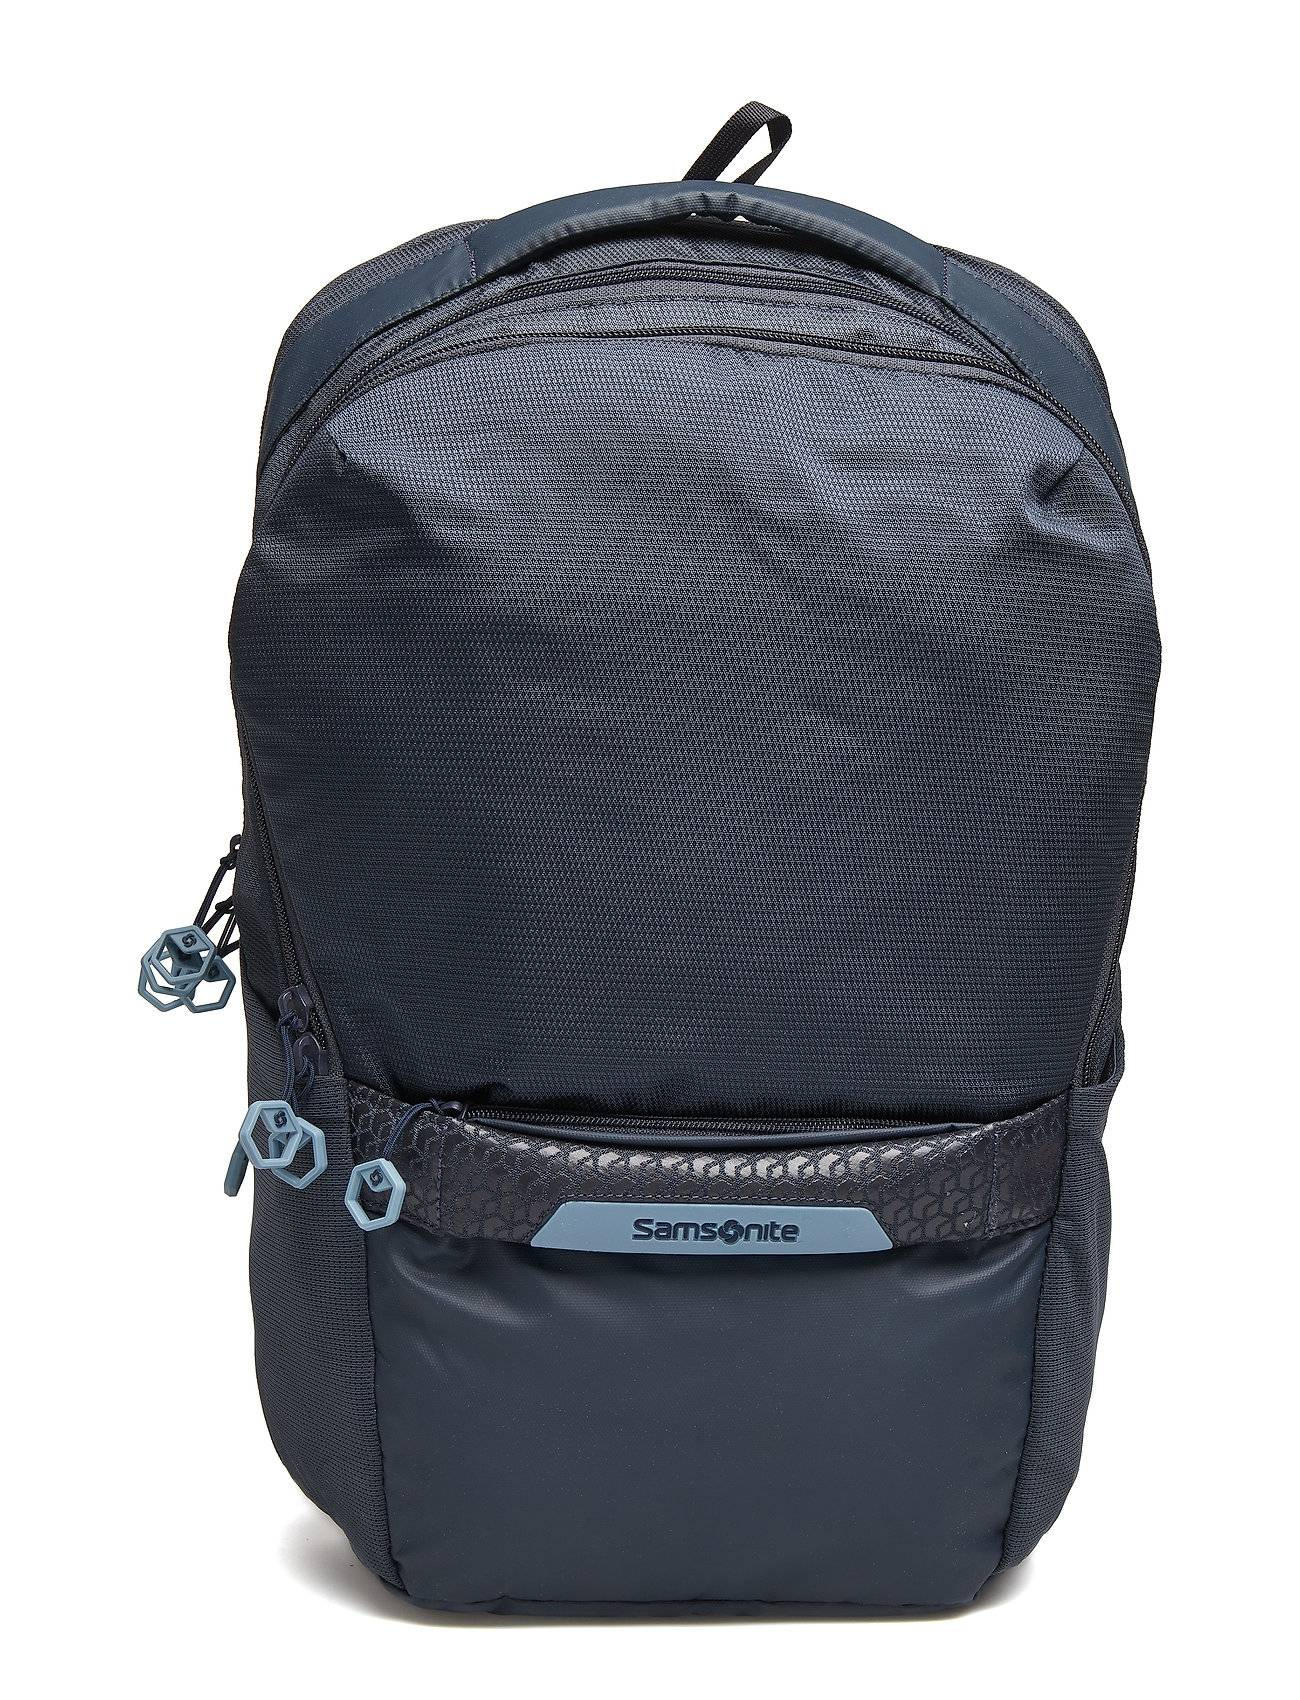 Samsonite Hexa Packs Laptop Backpack M Exp Work